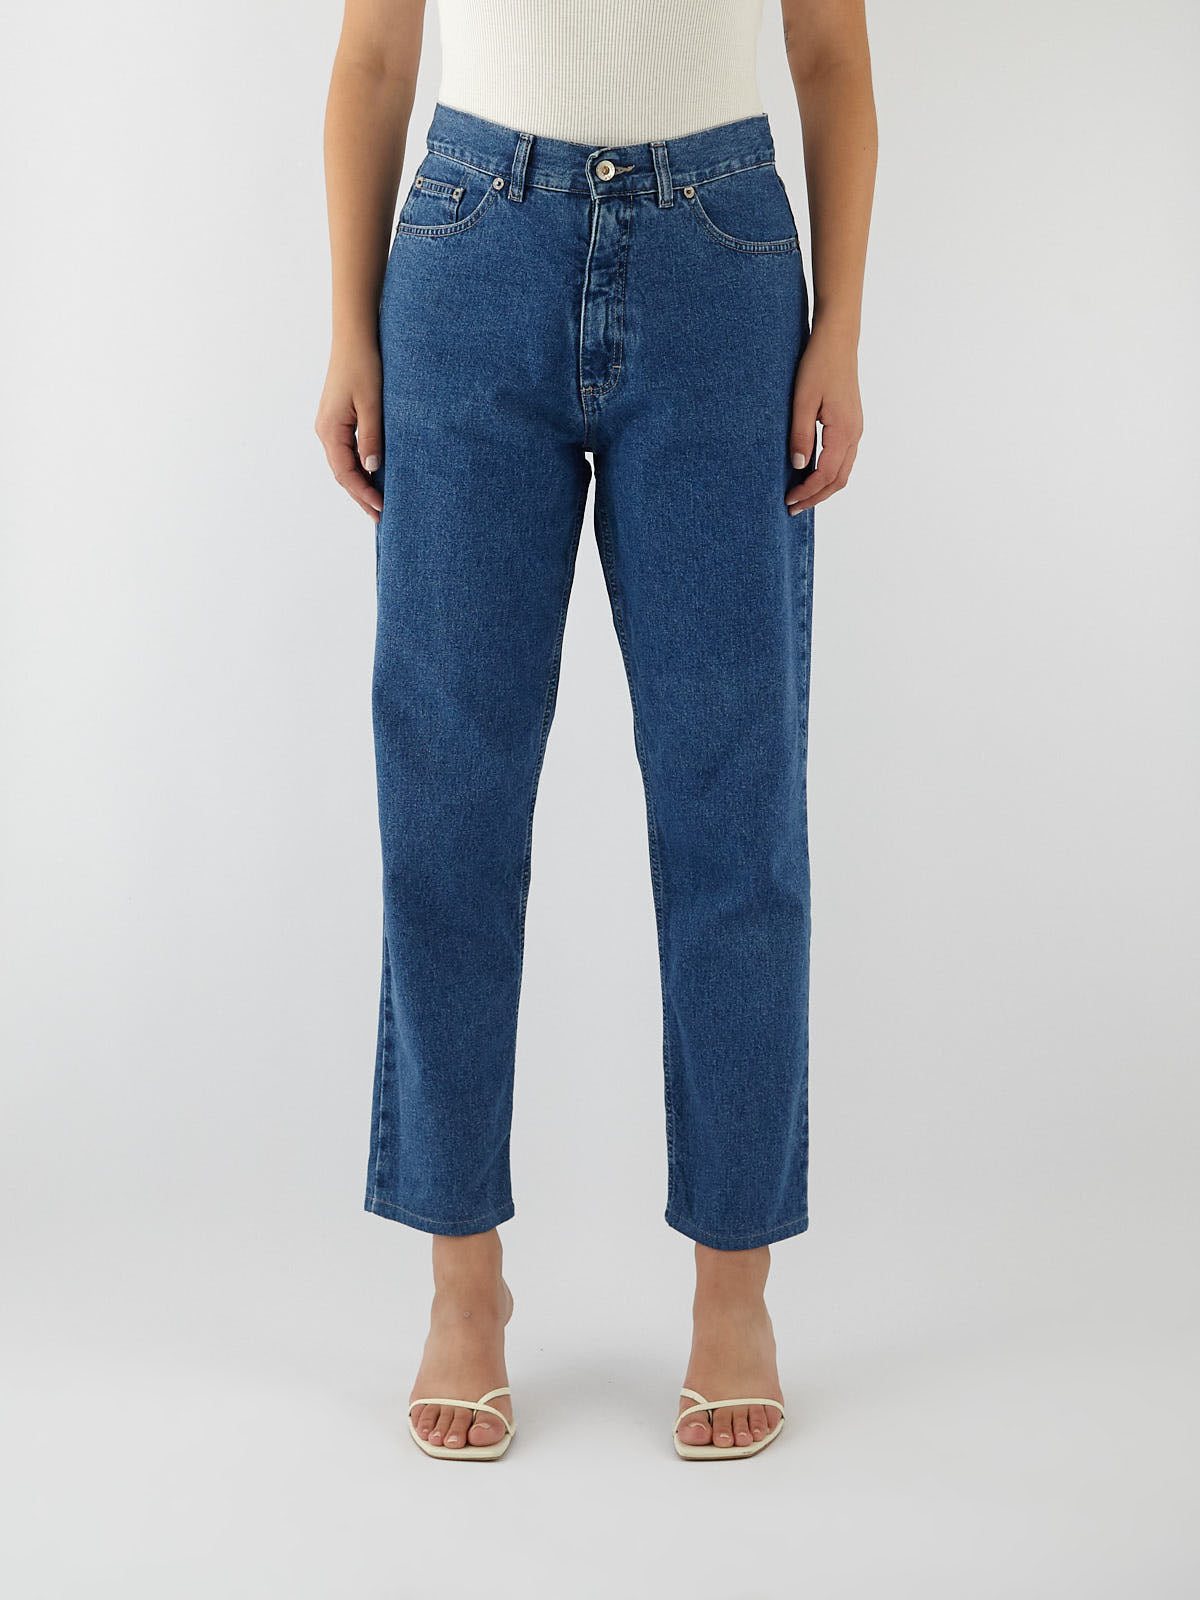 Fila Jeans